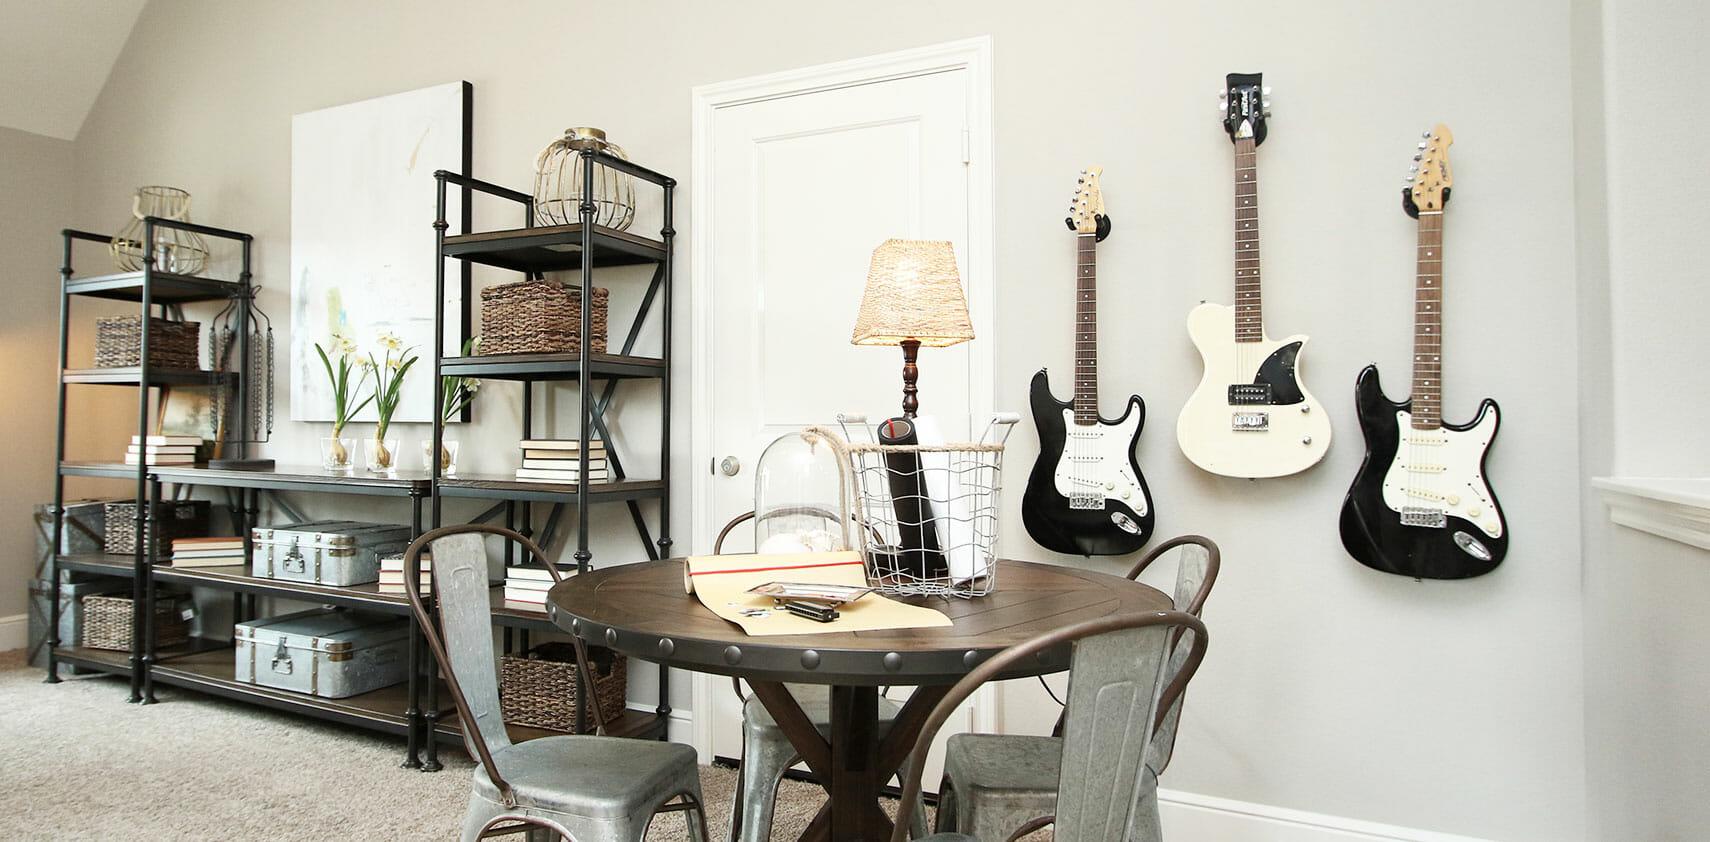 obsessions-guitars